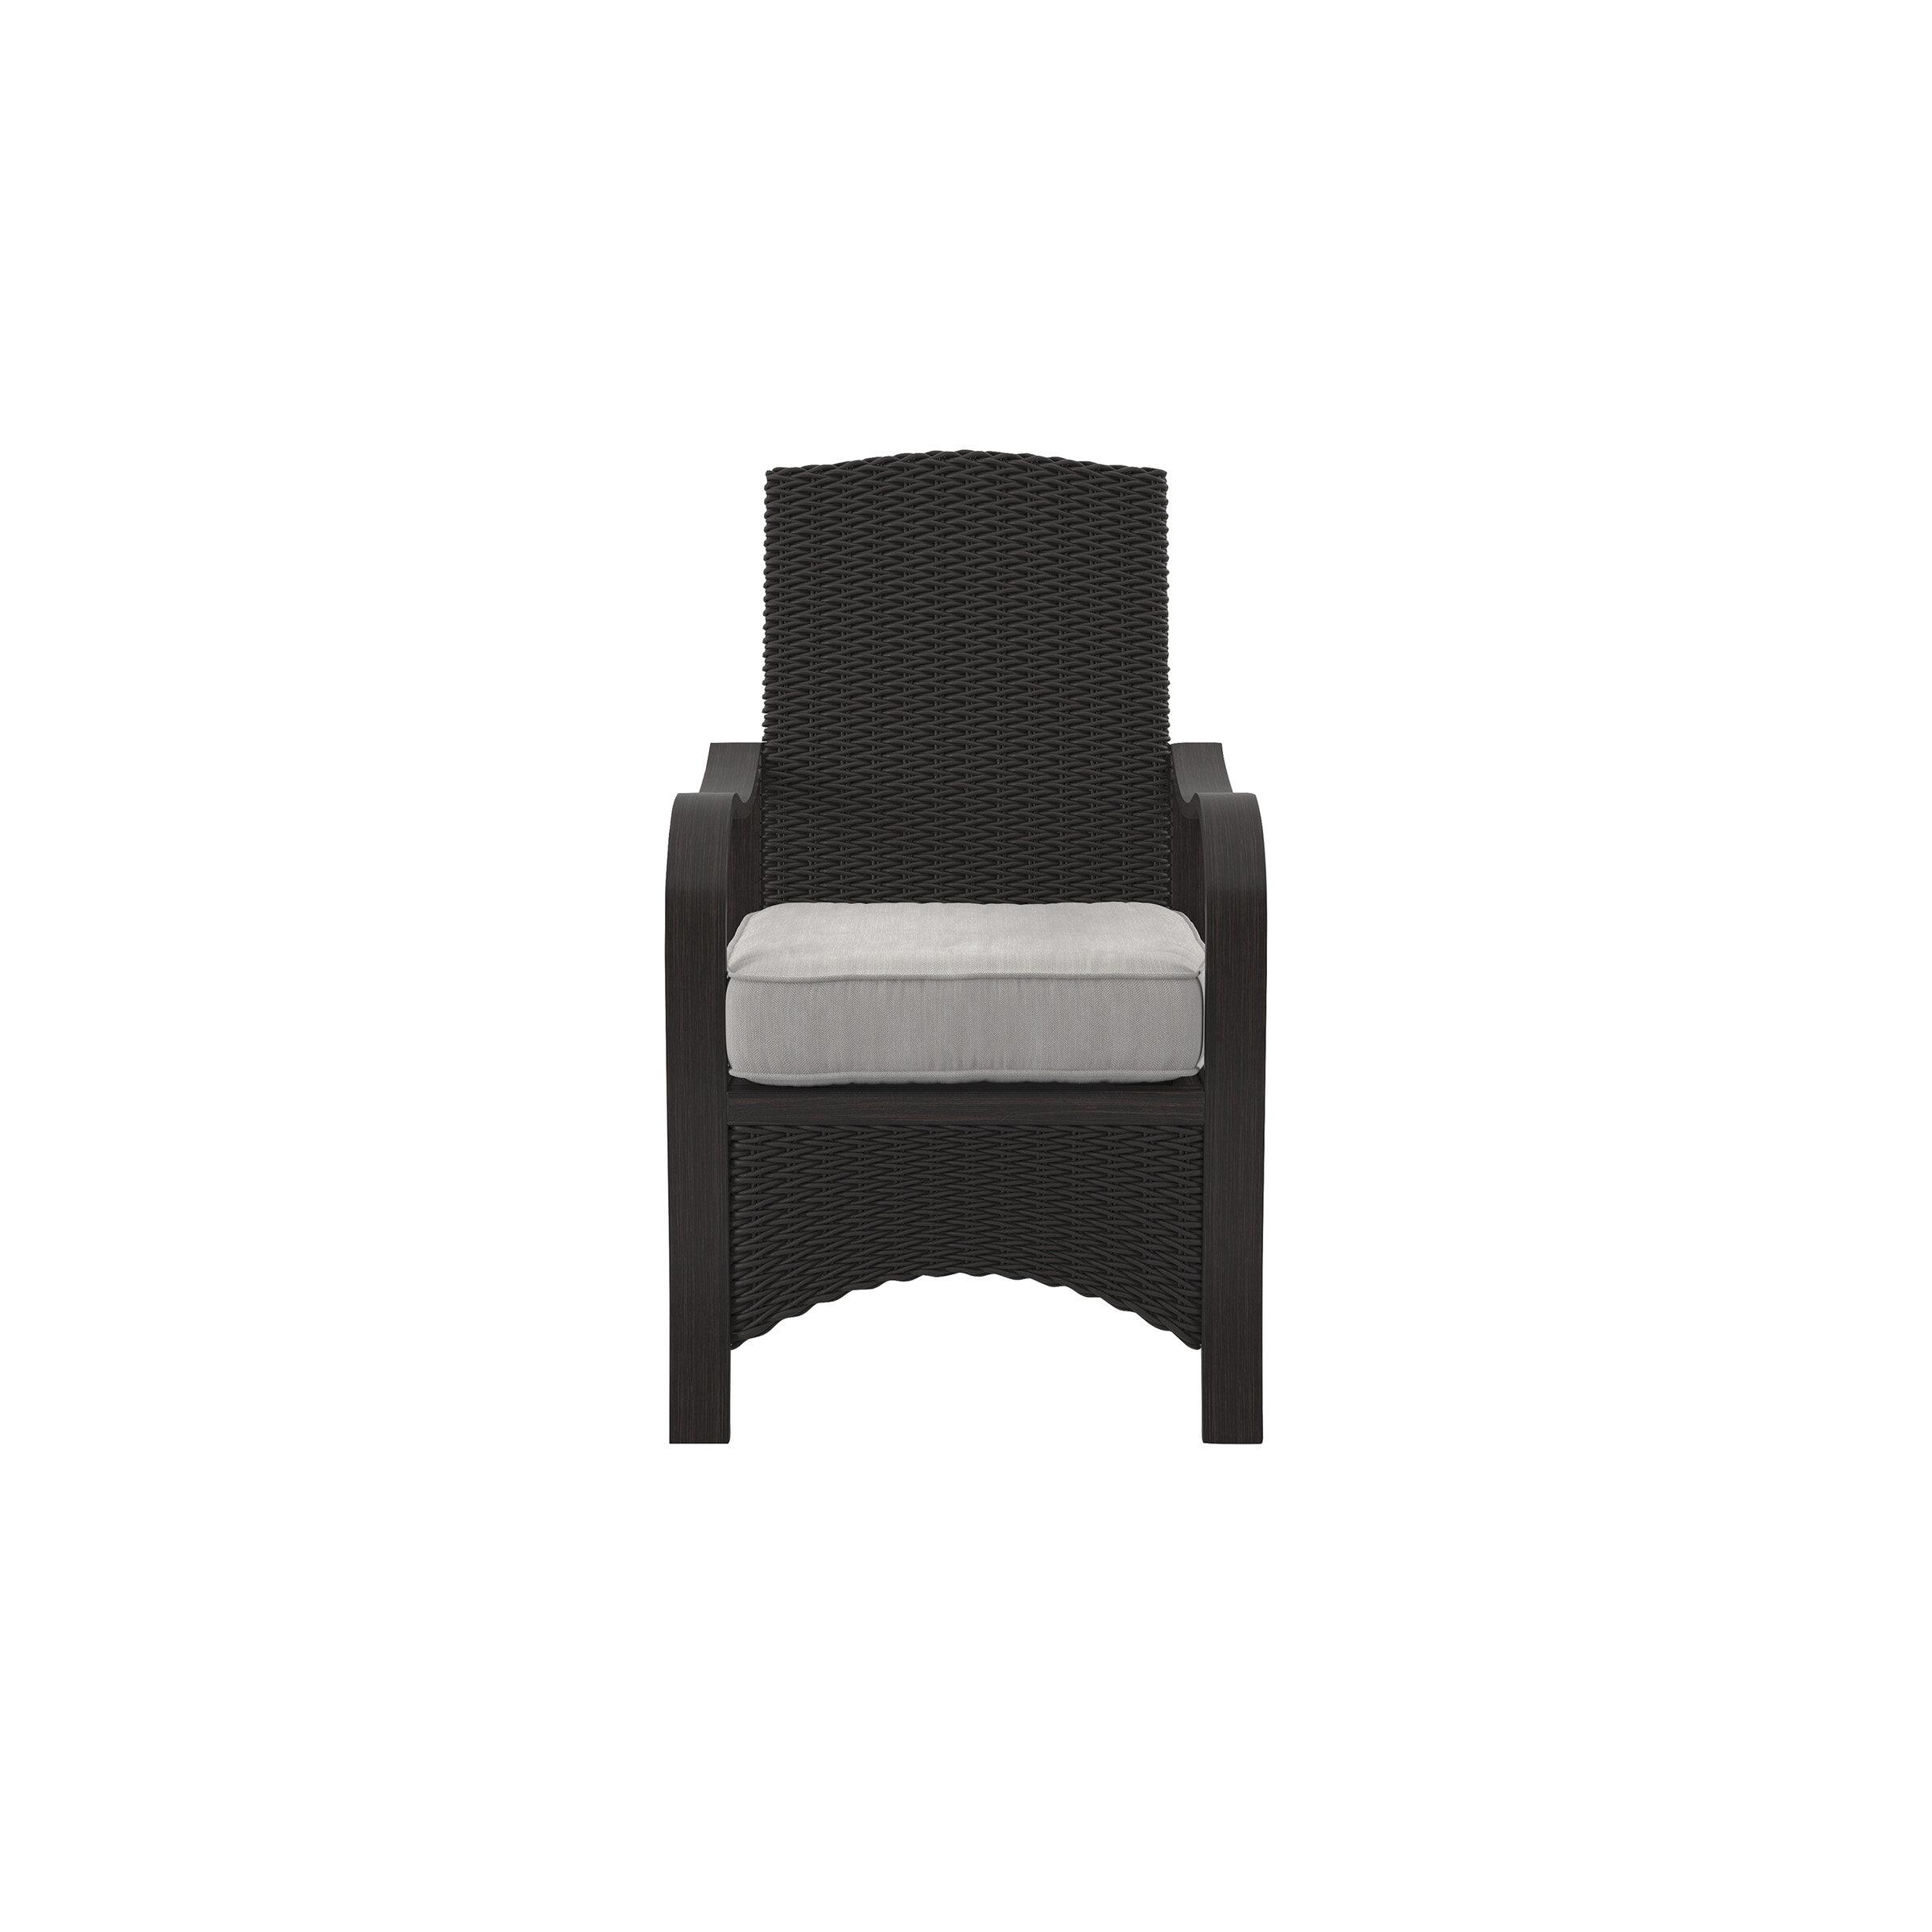 Forum on this topic: Bayou Breeze Kohn Patio Sofa with Cushions, bayou-breeze-kohn-patio-sofa-with-cushions/